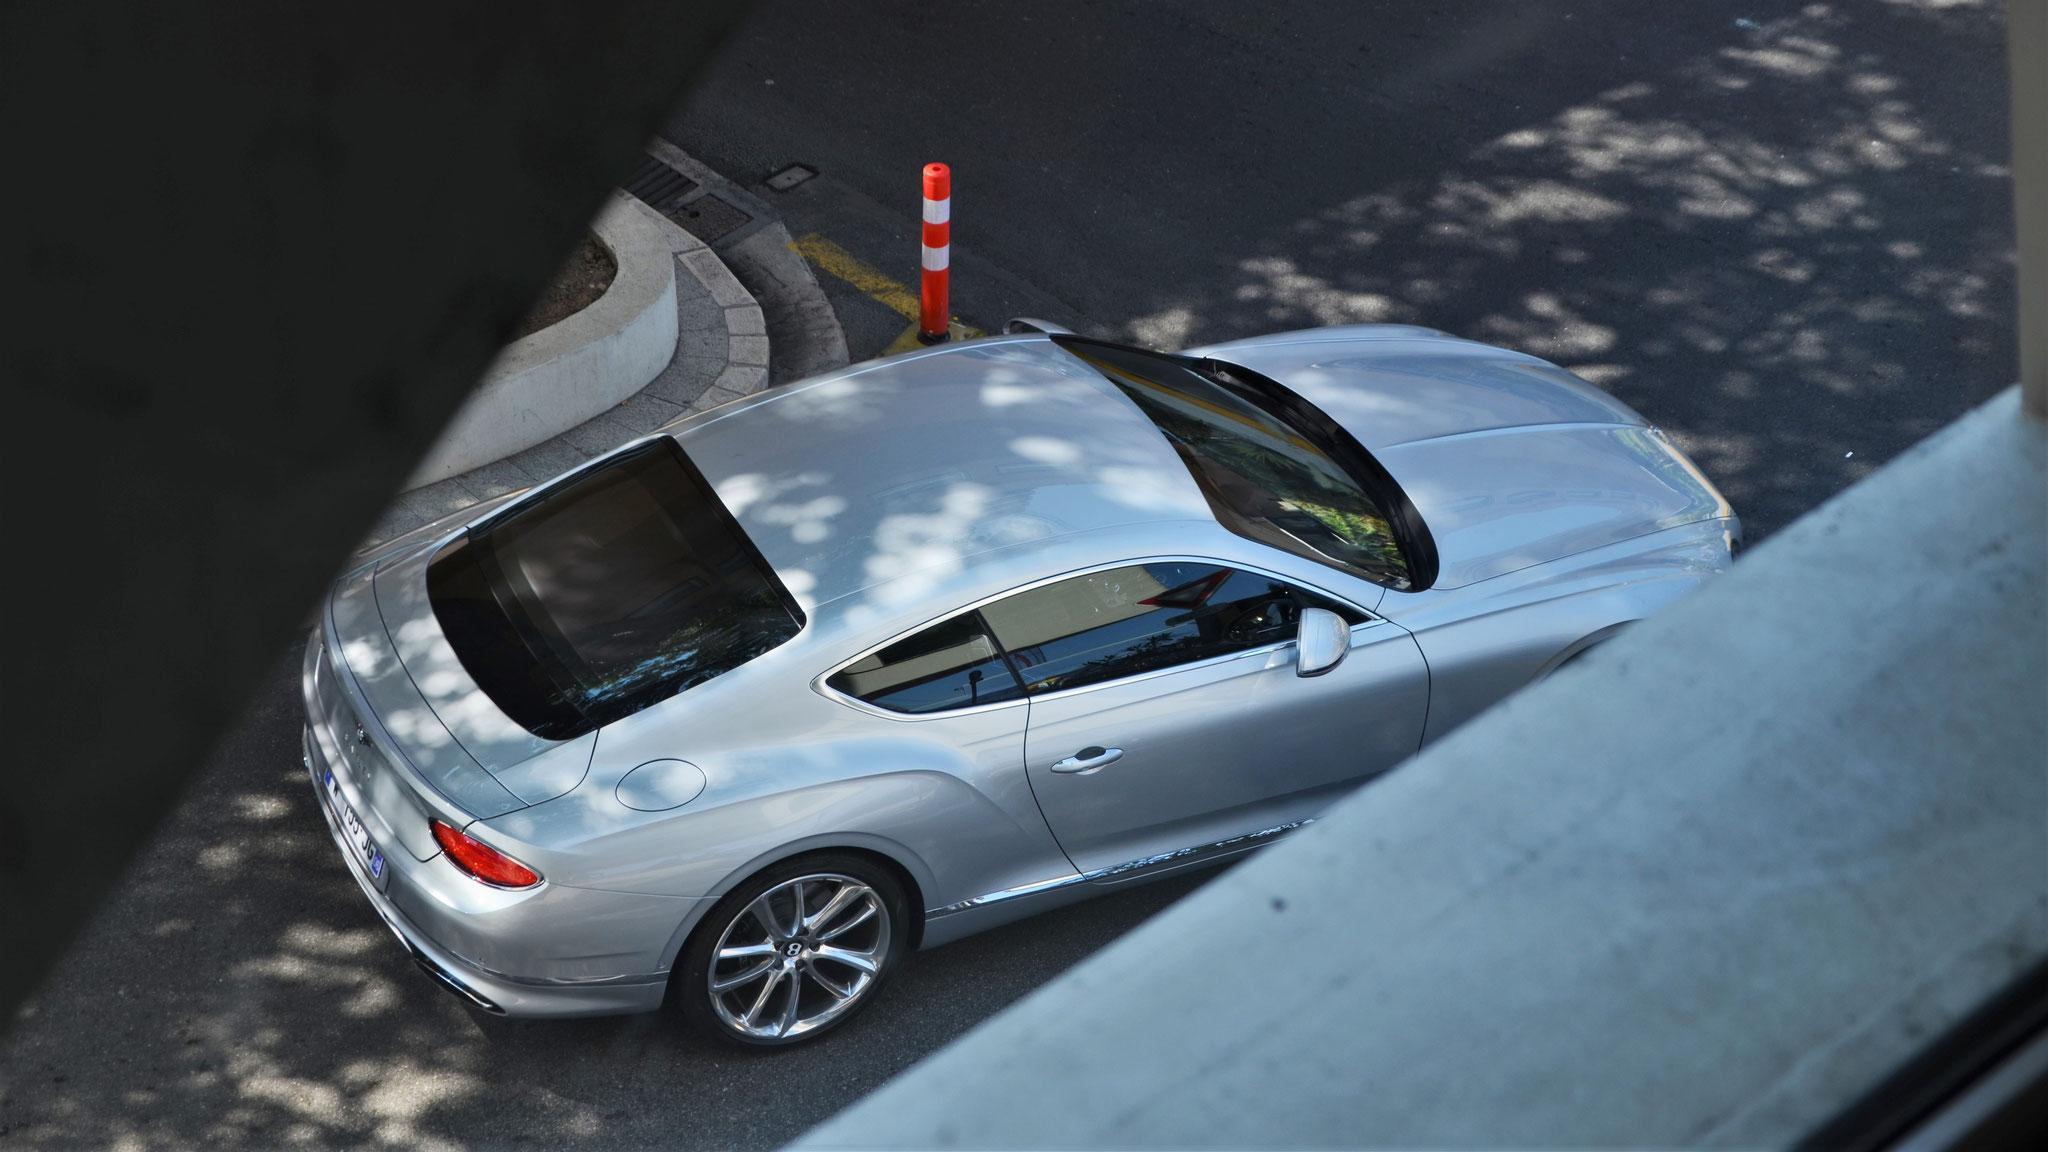 Bentley Continental GT - W-155-JG-06 (FRA)